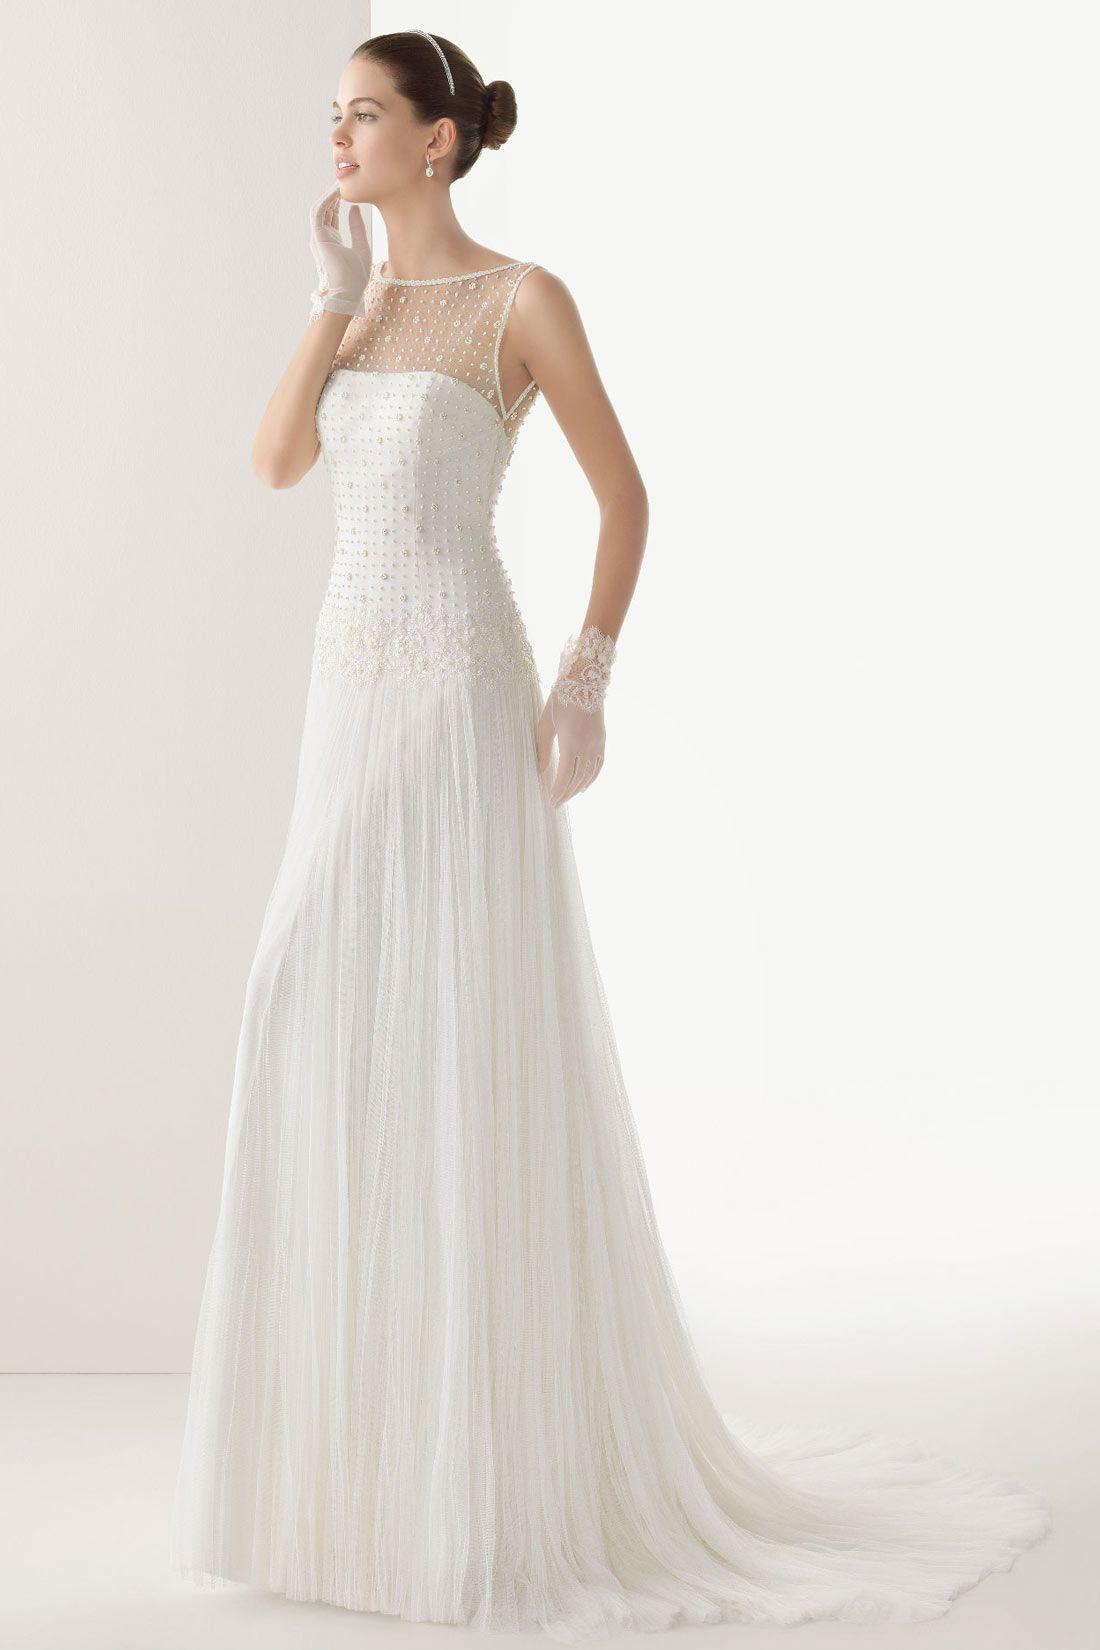 Chic robe de marie en tulle dos transparent robe de marie tulle sheer appliques button back sweep train wedding dress uk ombrellifo Gallery